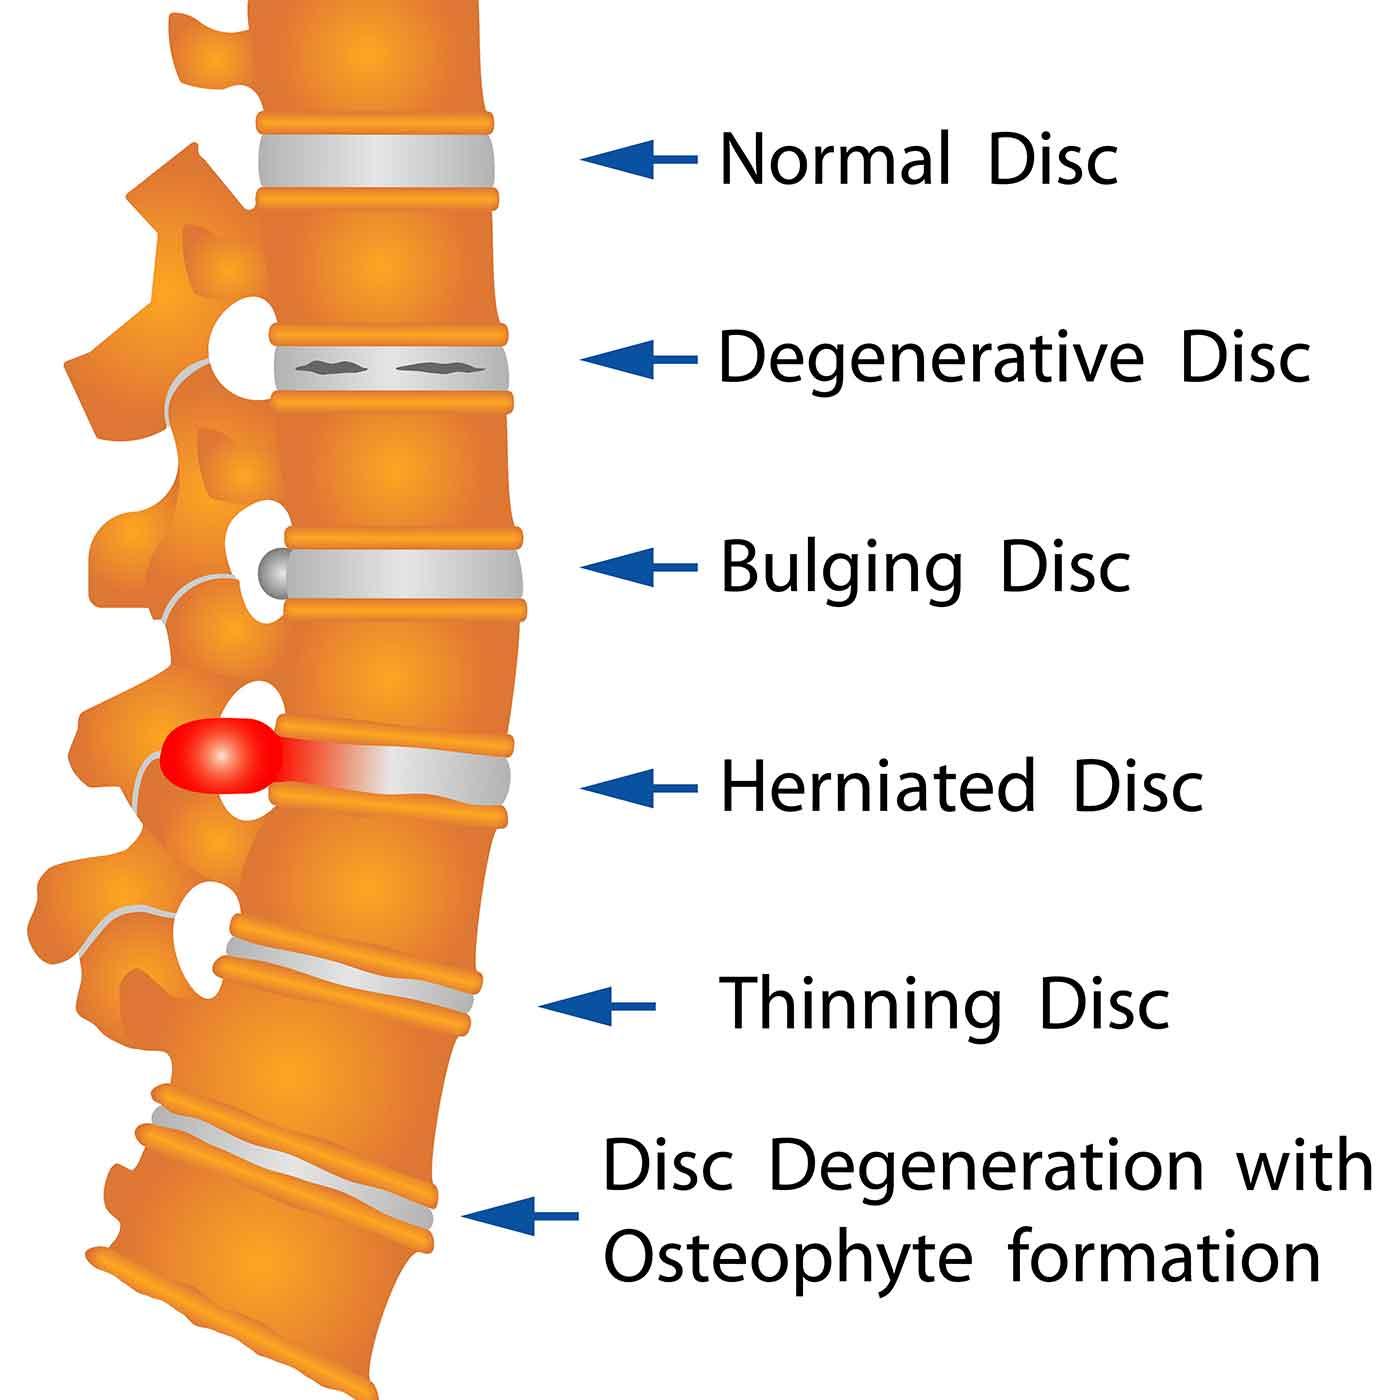 degenerative disc chiropractic services